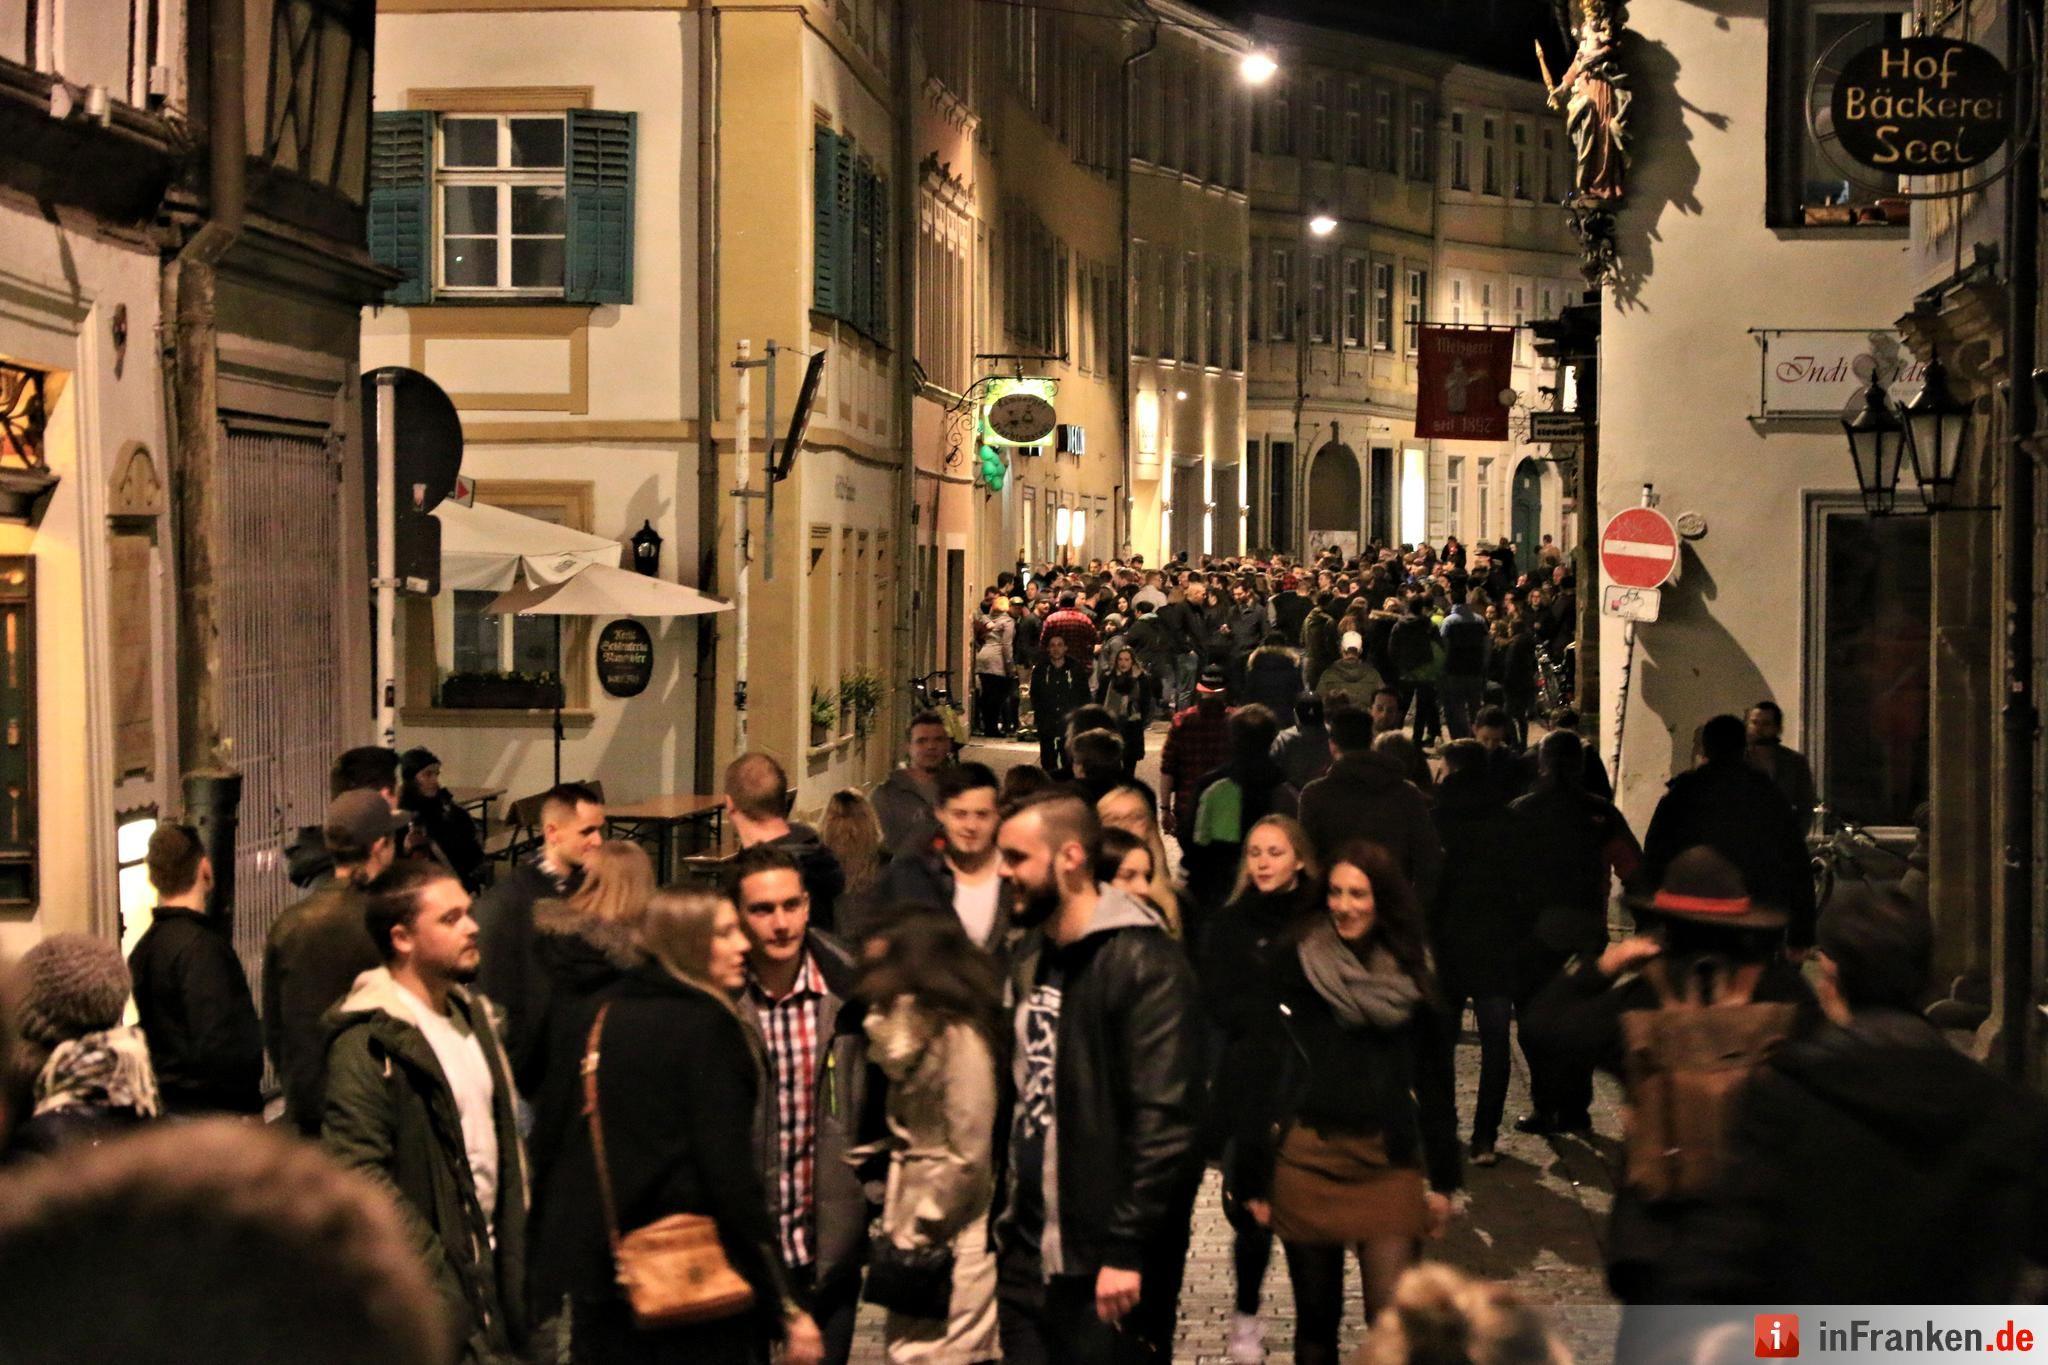 Bamberg tanzt | Samy deluxe, Bild aktuell, Tanzen